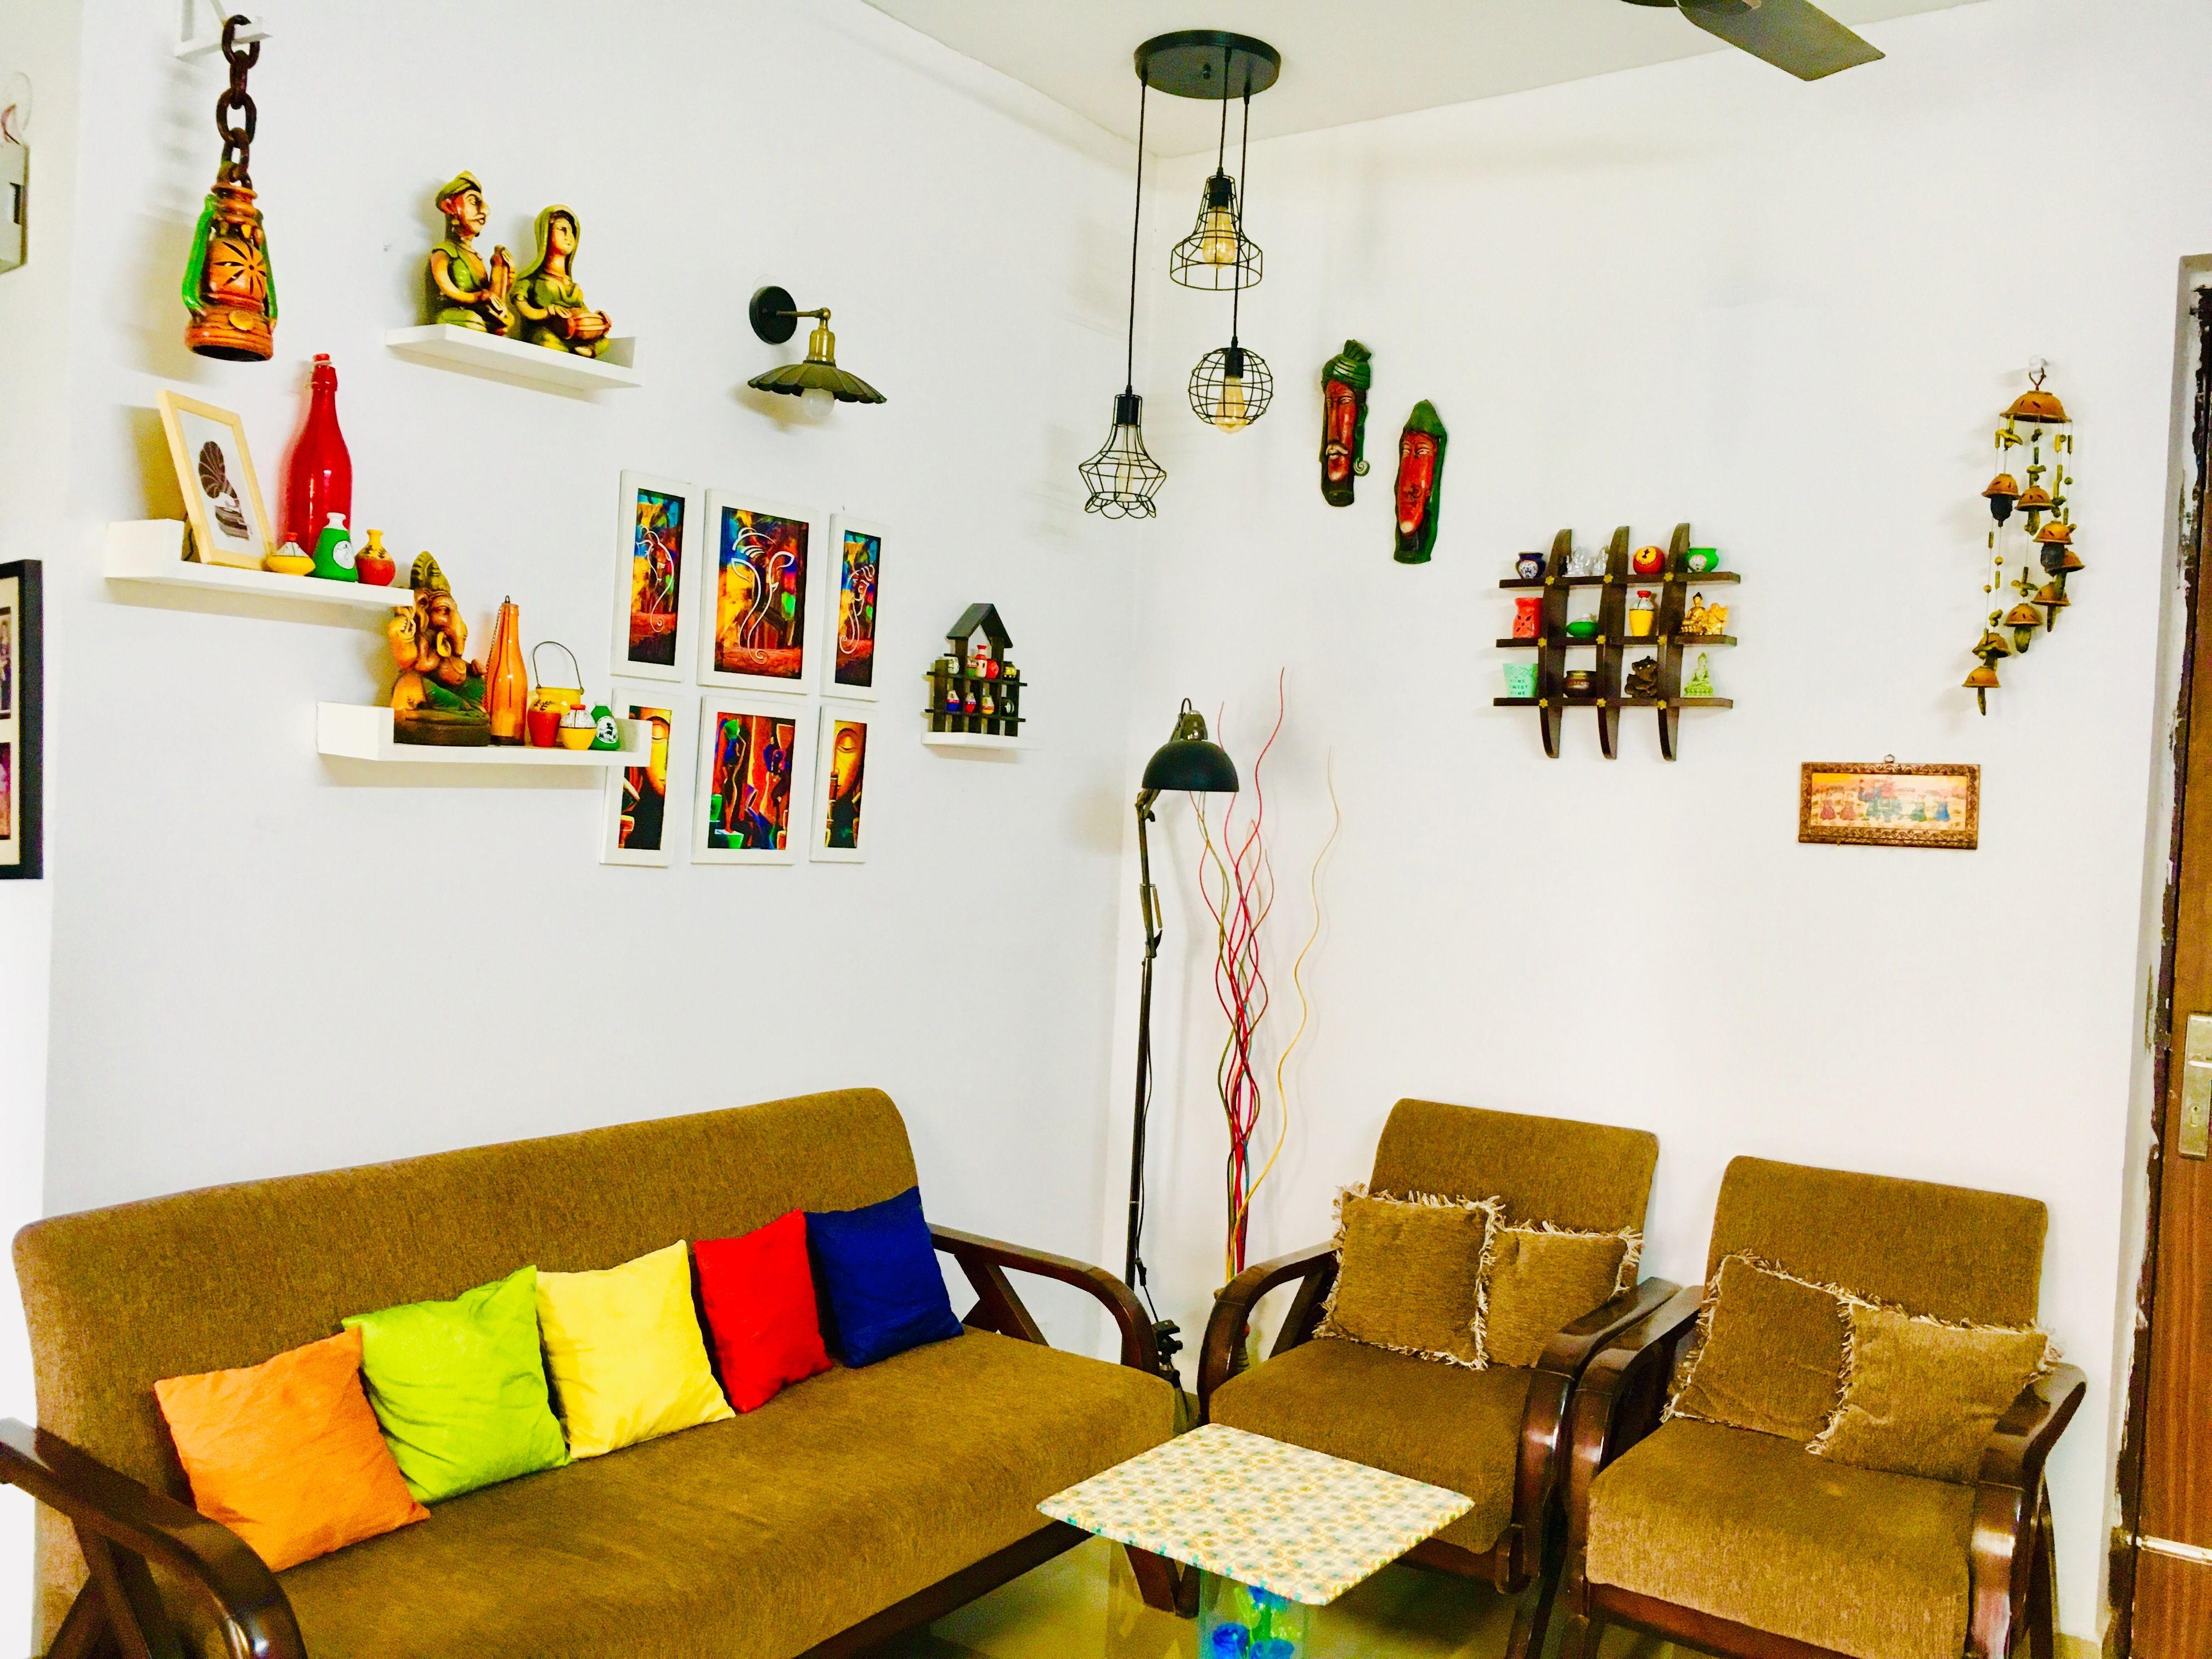 Living Room Decorating Ideas India Indian Decor House Plants Decor Room Wall Decor